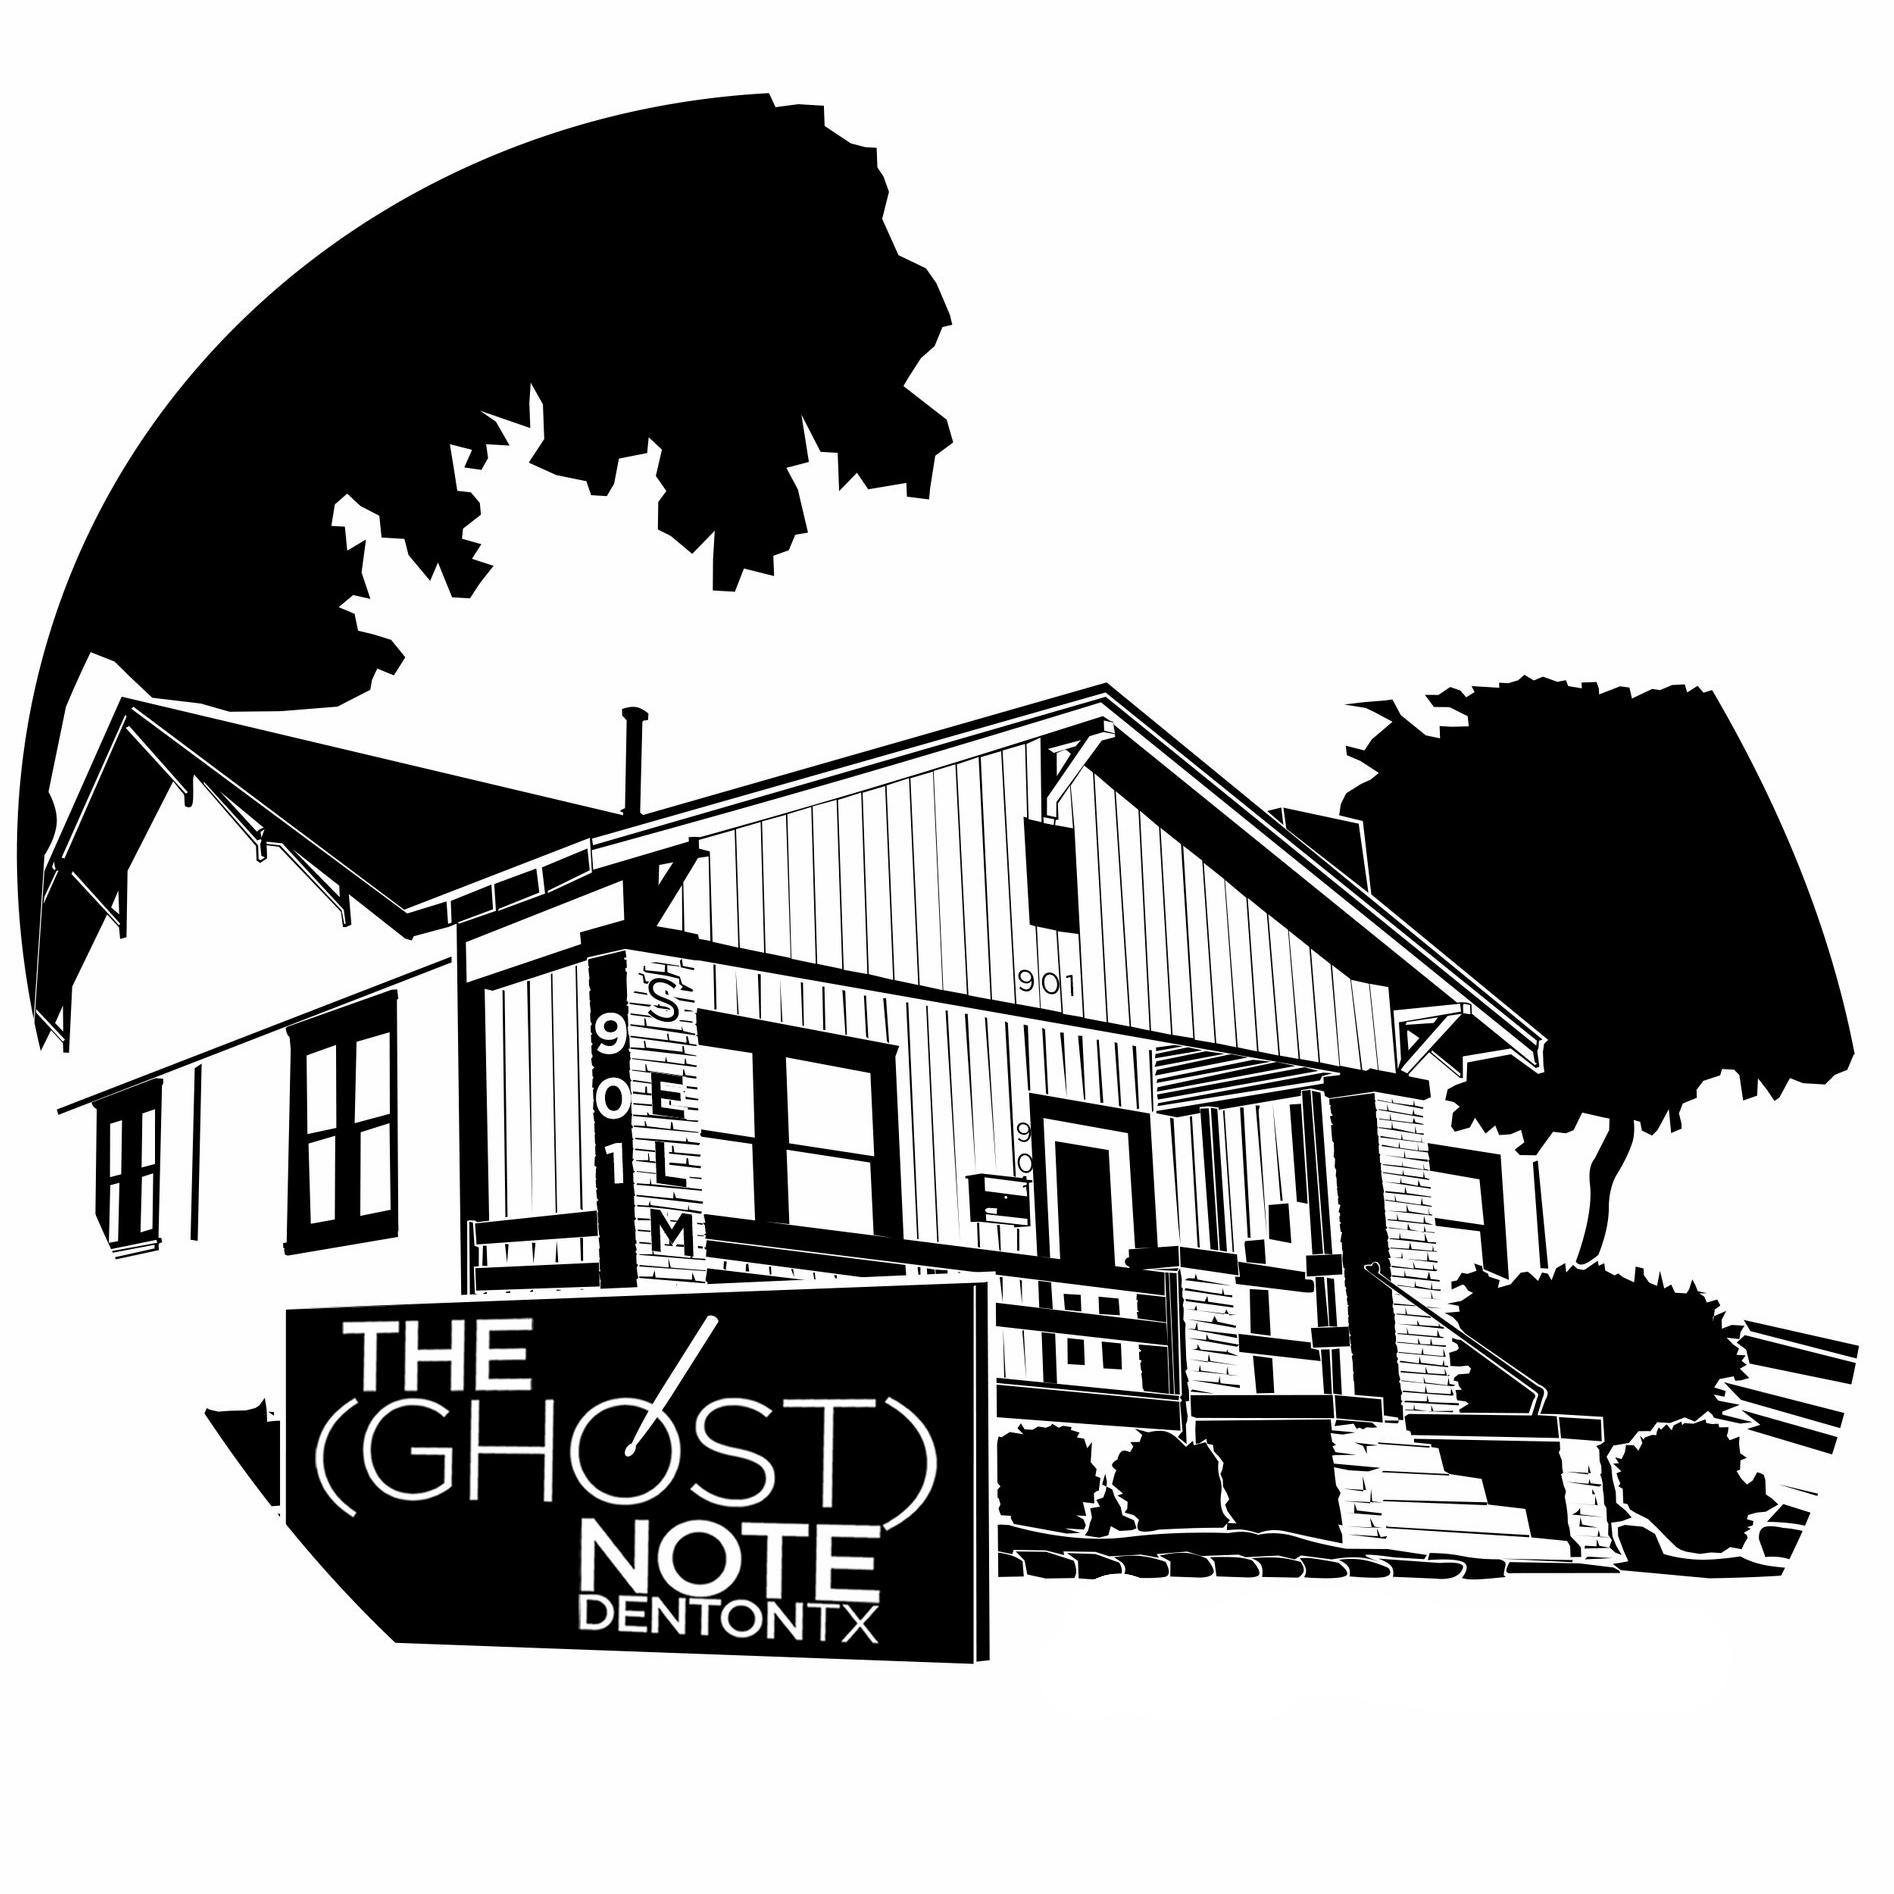 DRUM SHOP & MUSIC SCHOOL - 901 S. Elm St.Denton, TX 76201MONDAY - SATURDAY: 12-8pm